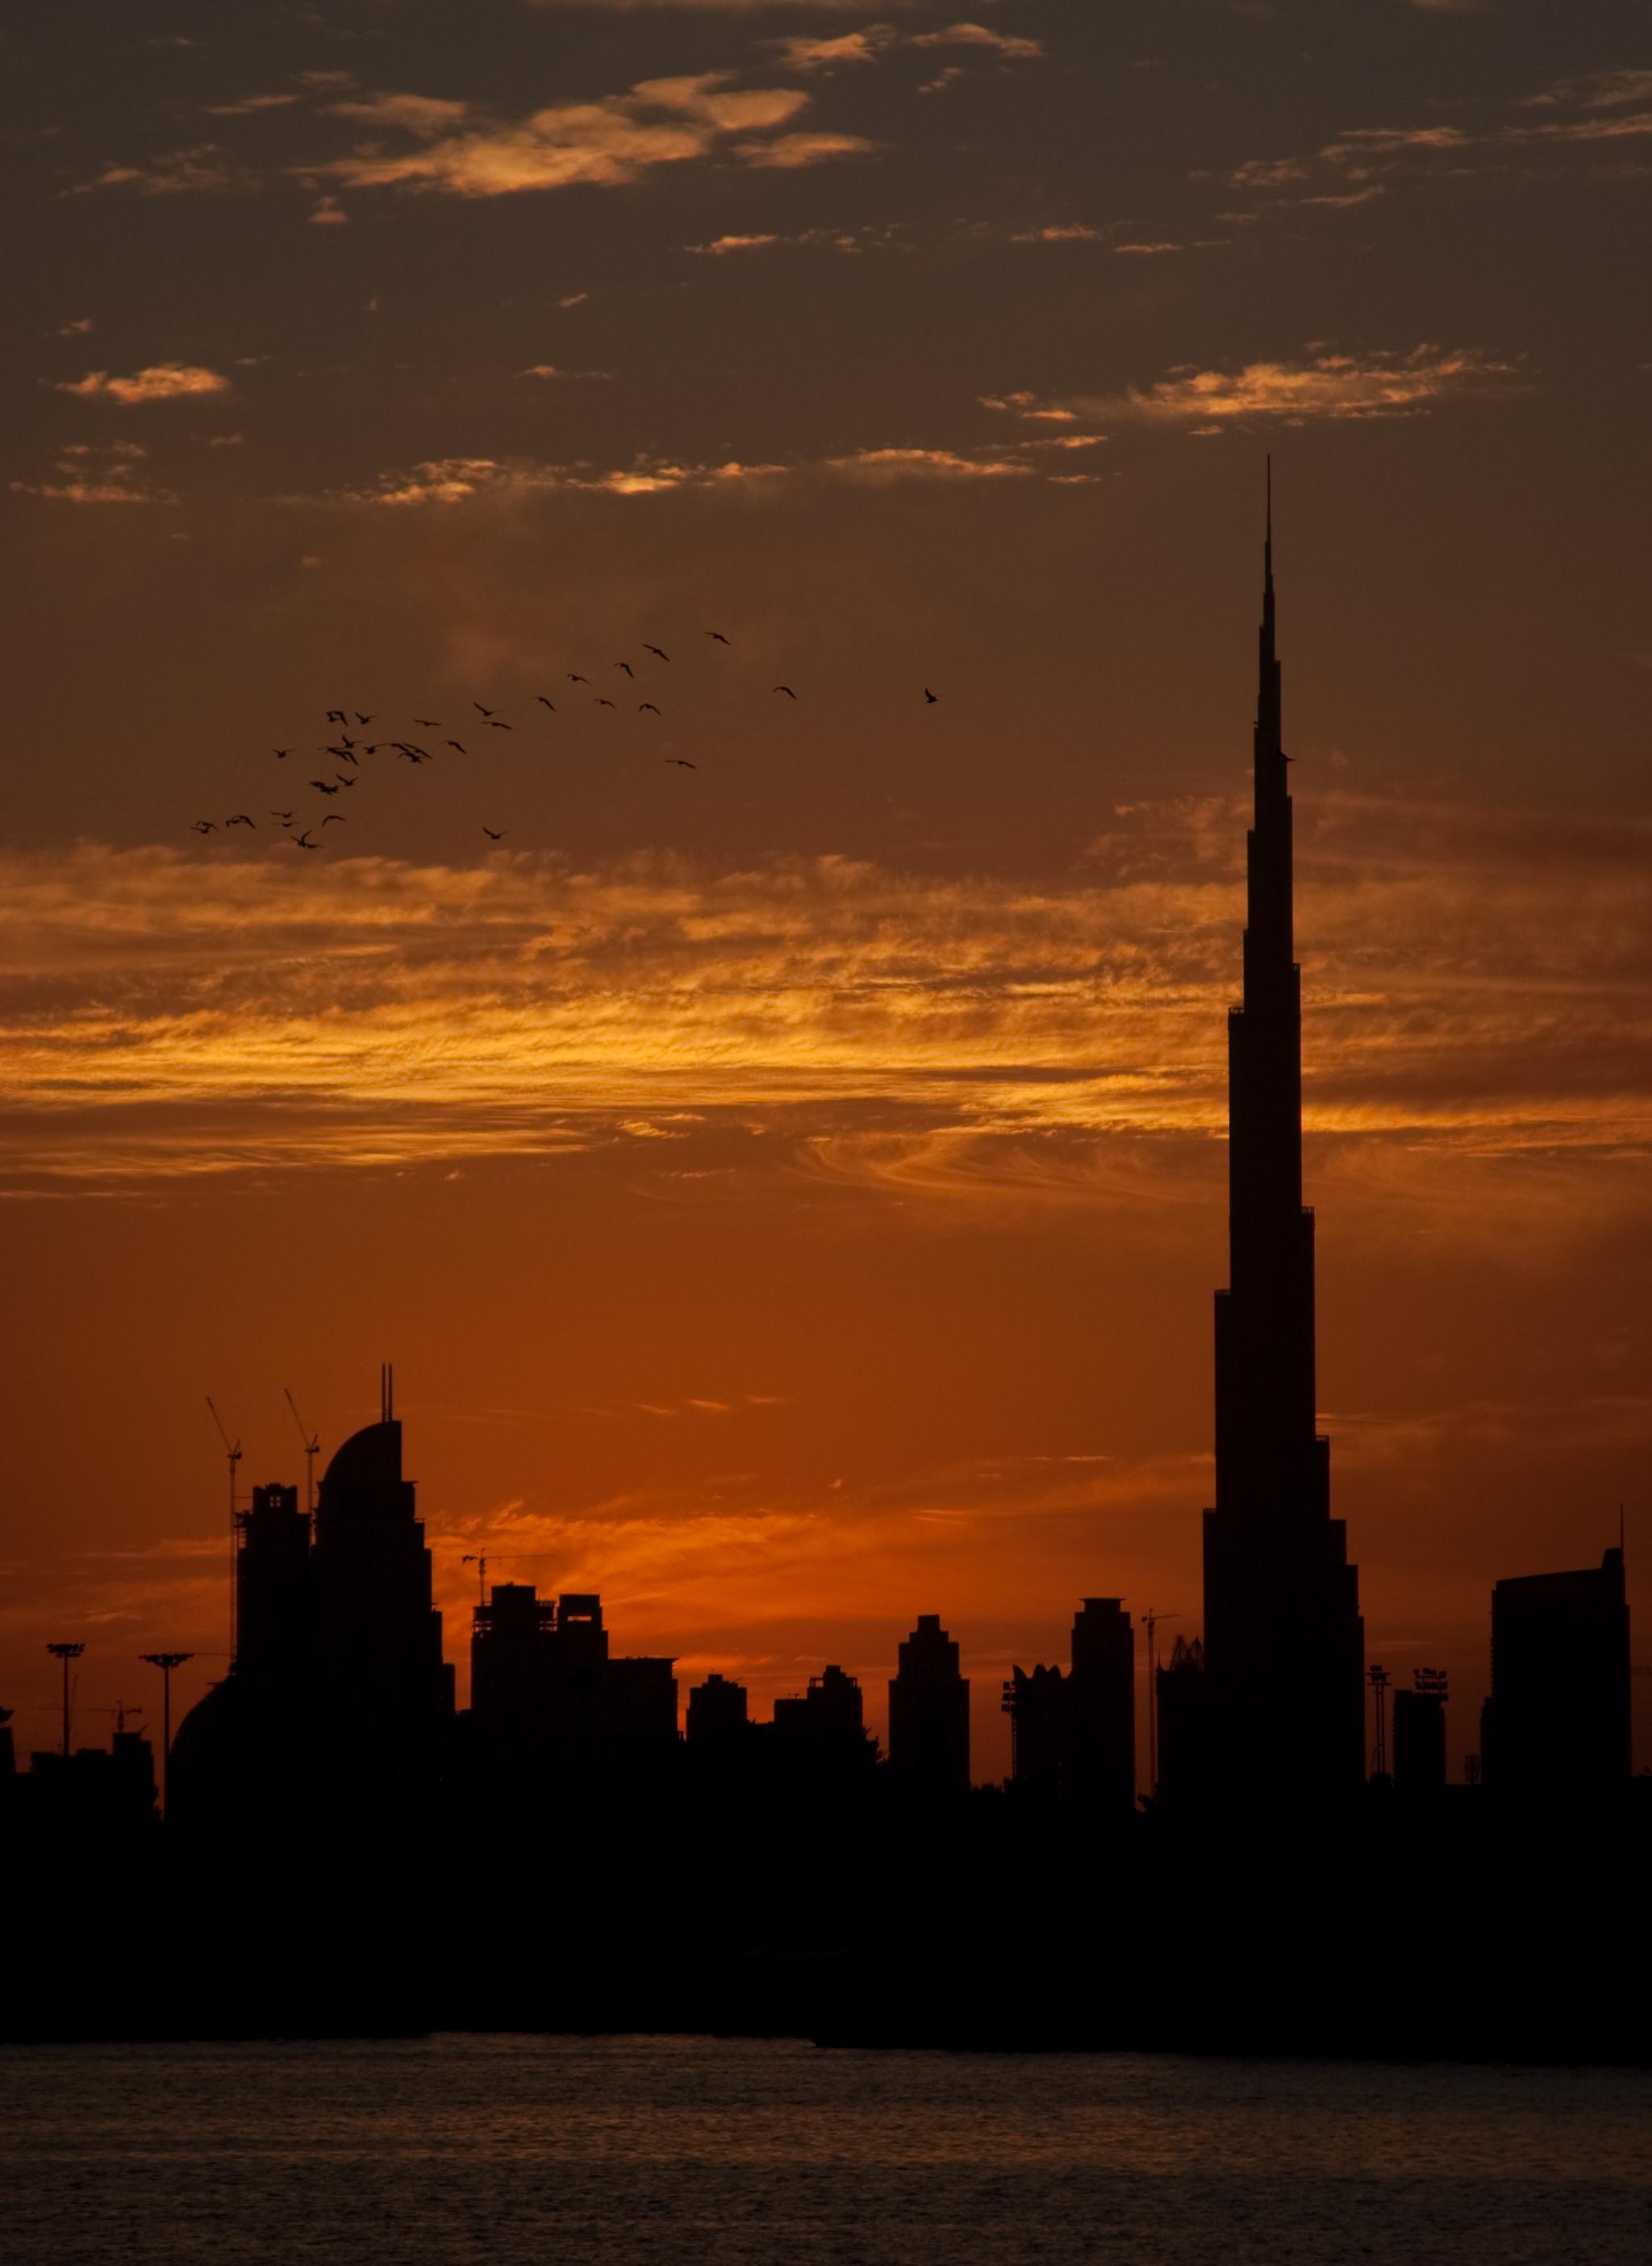 Burj Khalifa Silhouette